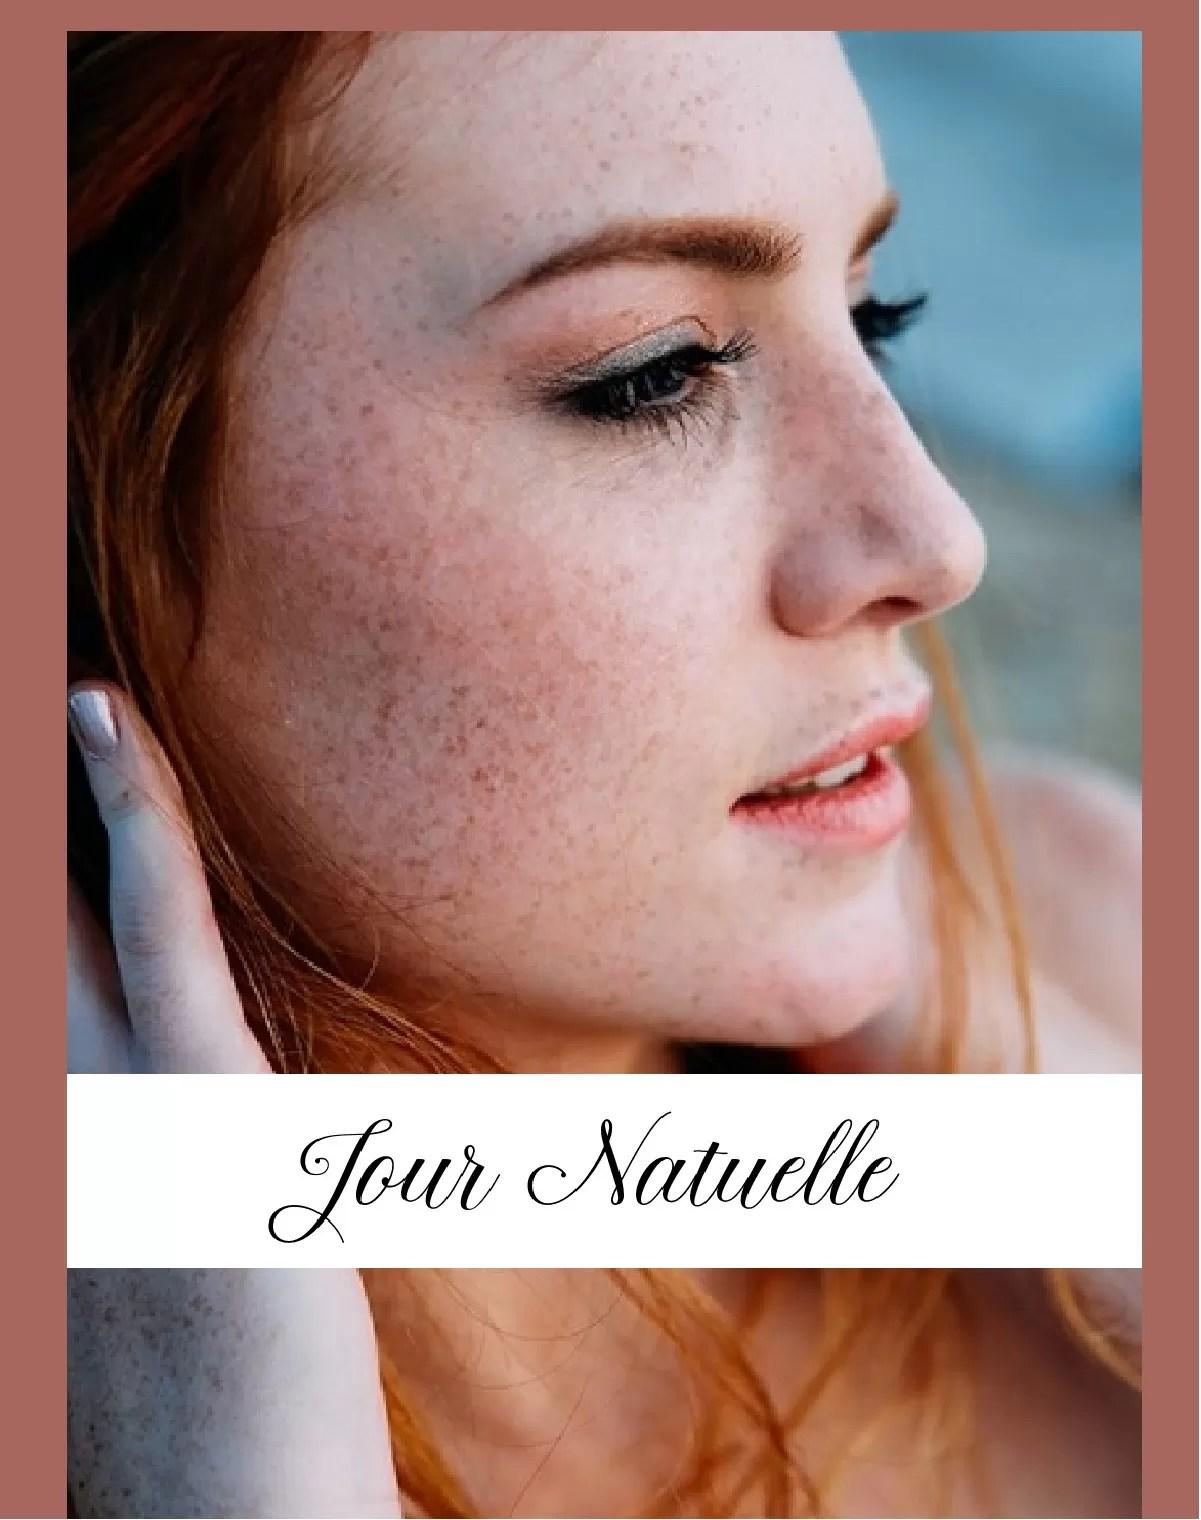 formation maquillage jour naturelle nude Normandie Cherbourg la Manche